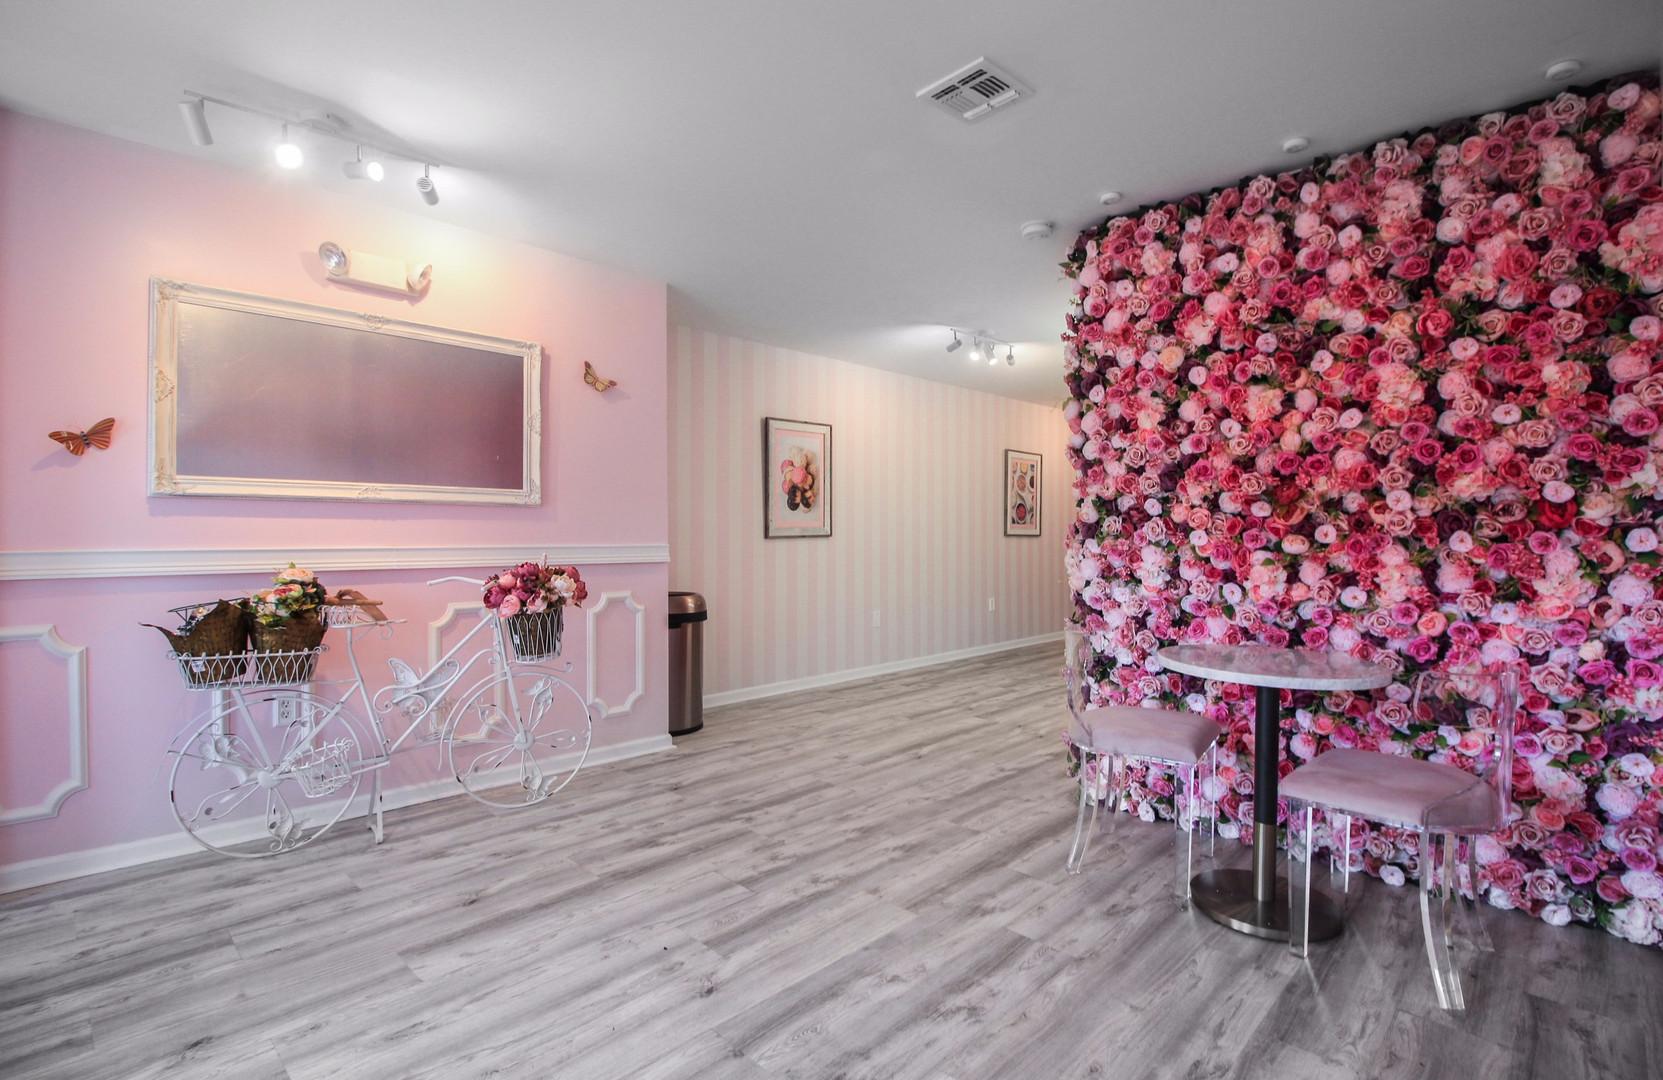 Pinkies Cupcake Cafe1